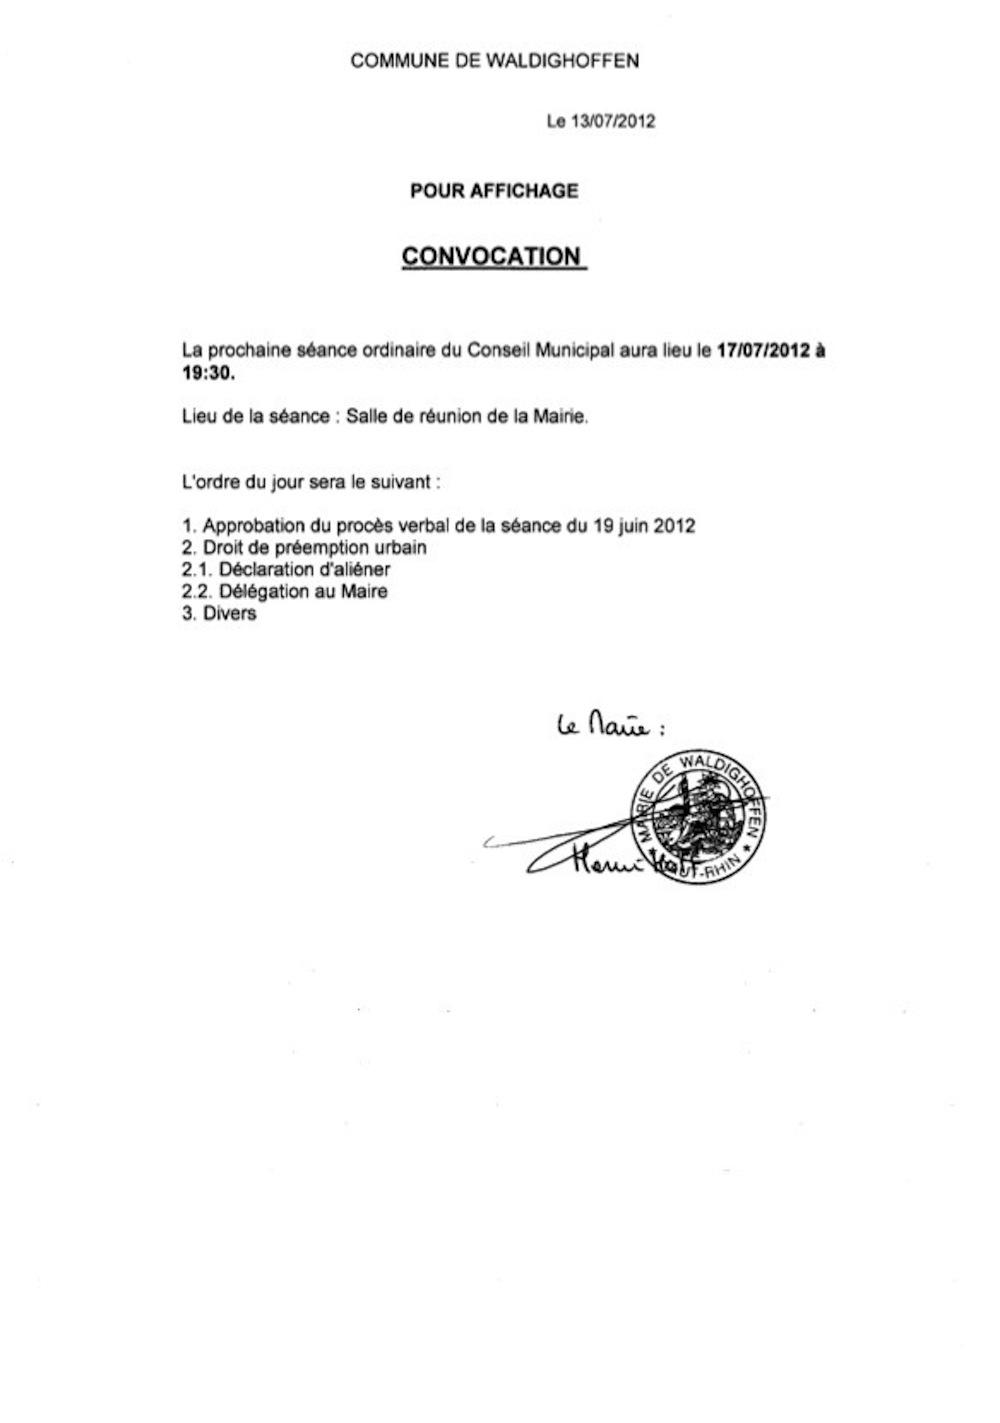 Convocation Conseil Municipal le 17.07.2012